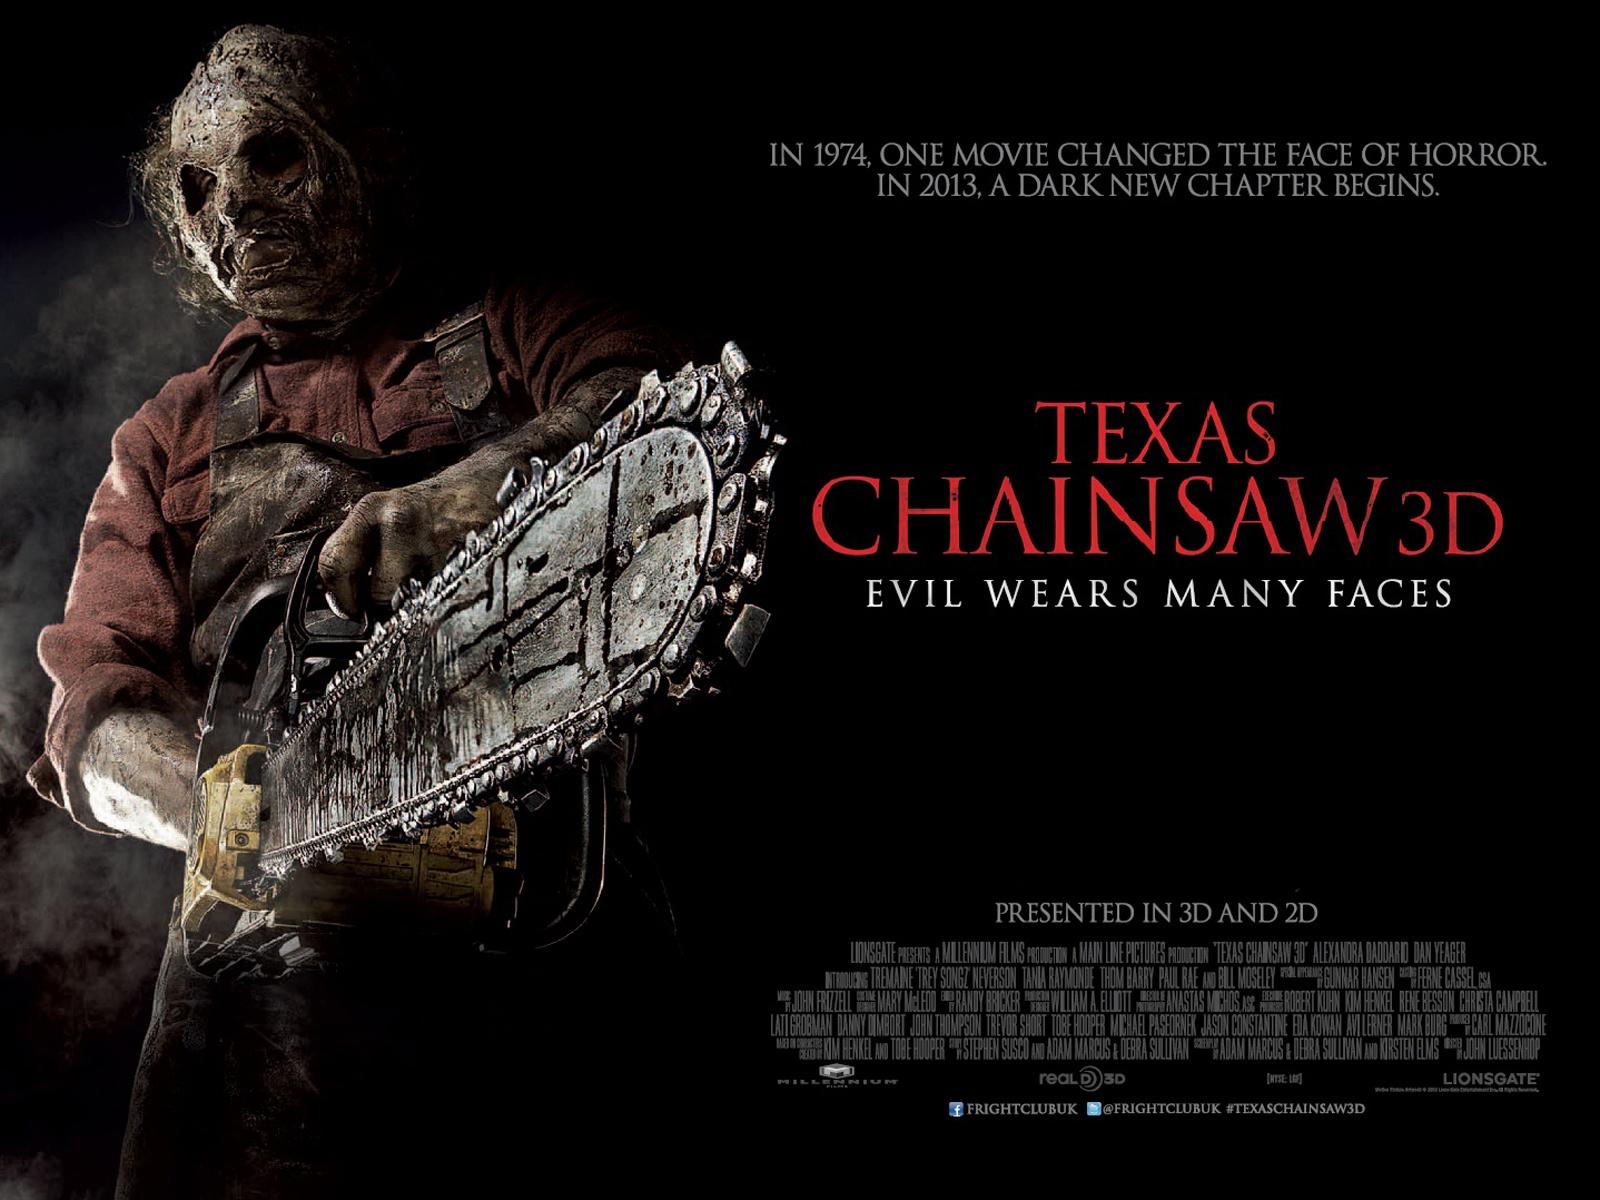 darkmatters - the mind of matt: darkmatters review: texas chainsaw 3d